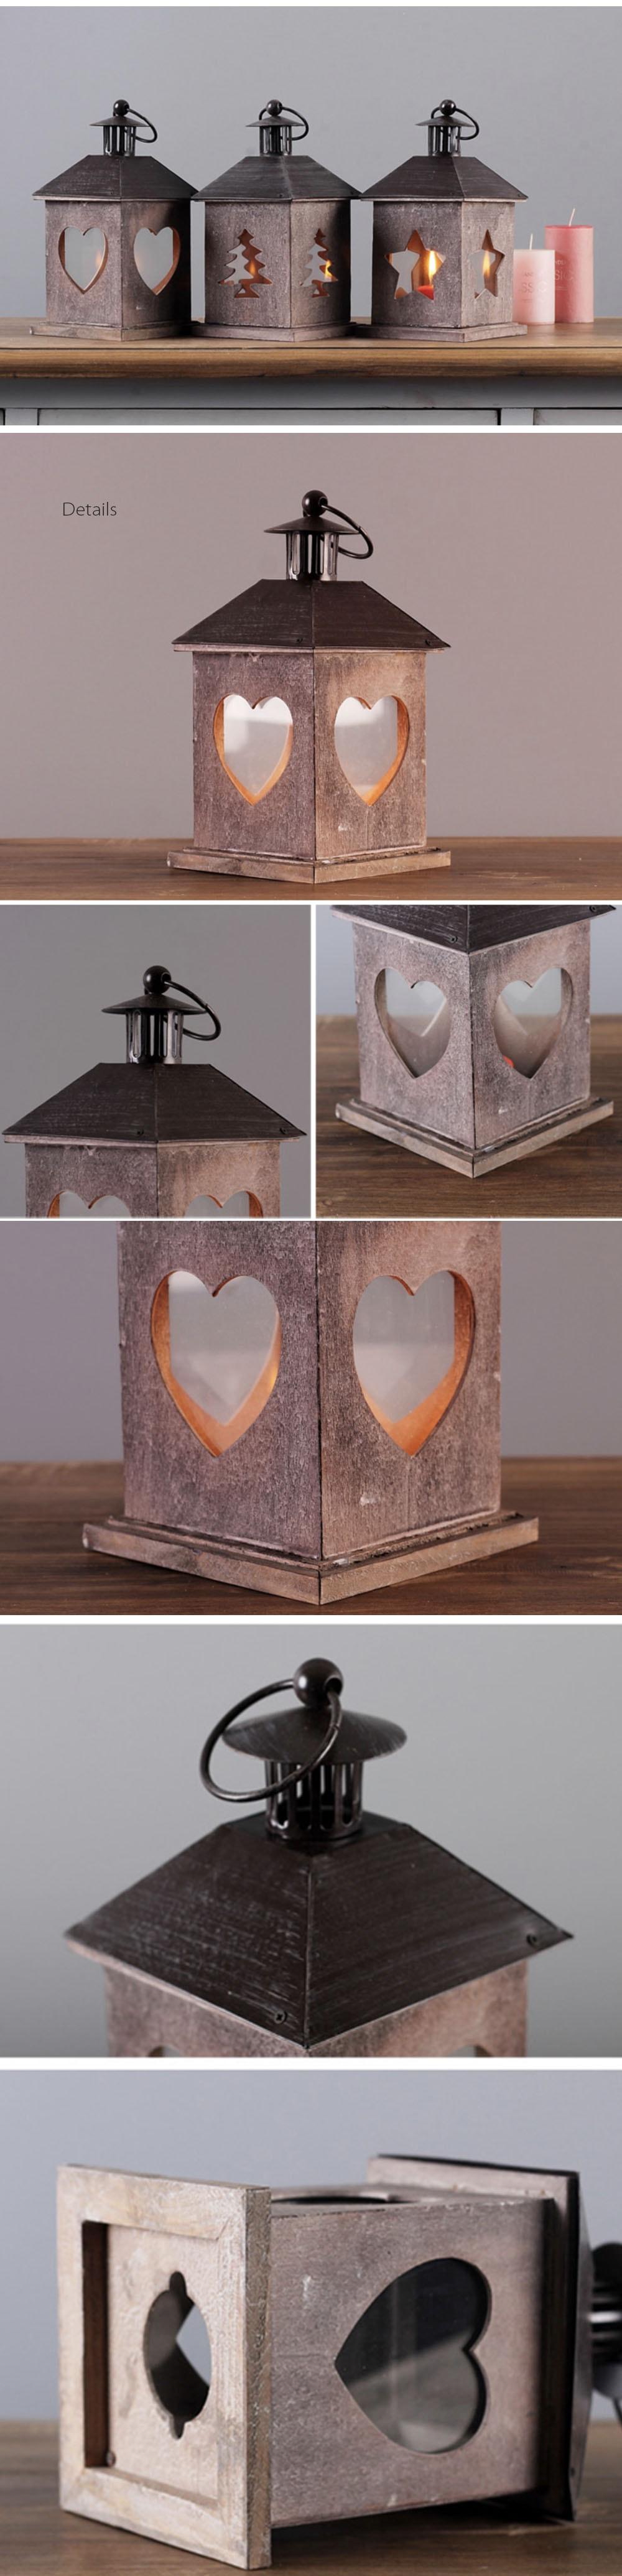 Vintage Style Lantern House Pattern Candle Holders